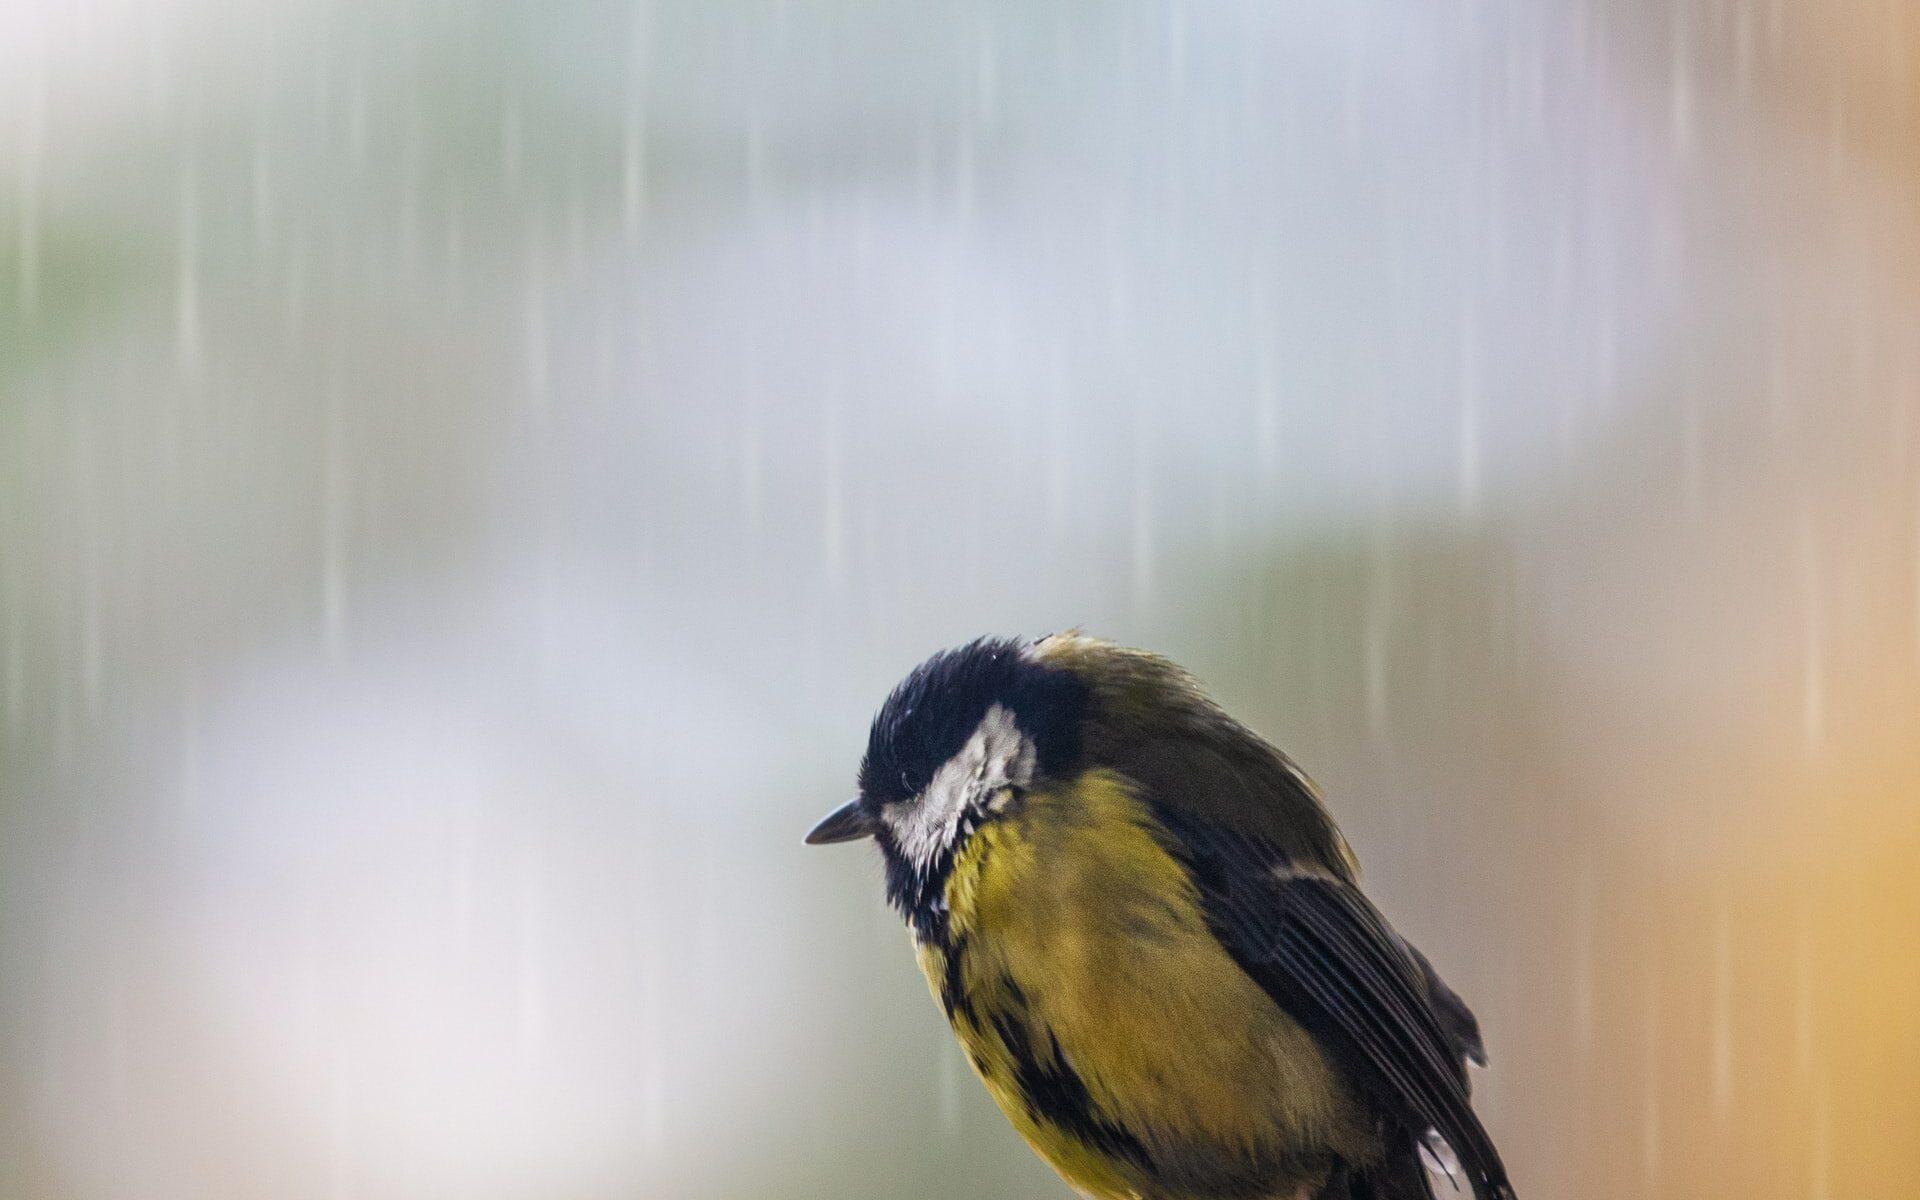 Wet bird in the rain